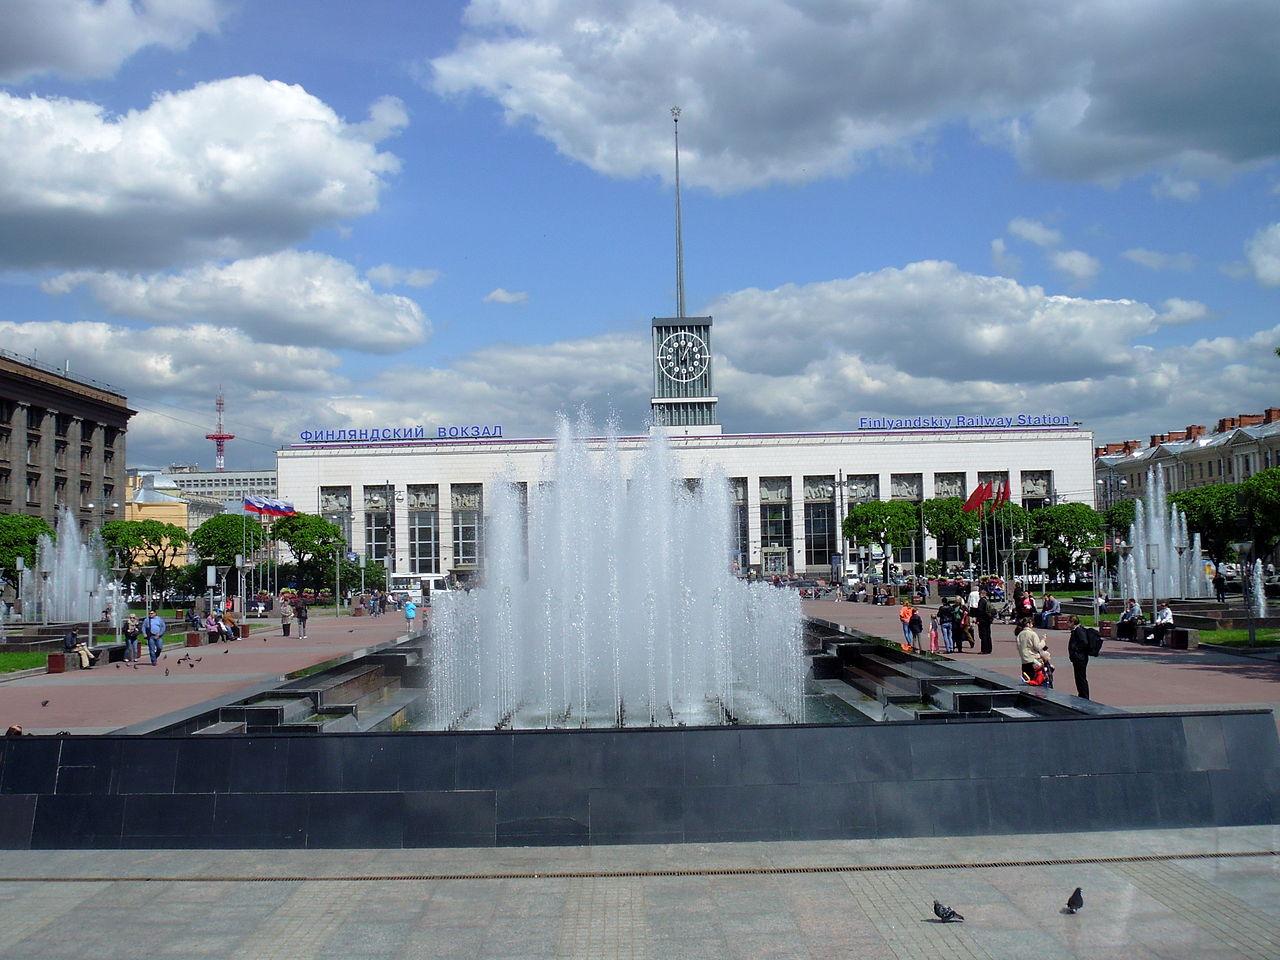 Финляндский вокзал и фонтан на площади Ленина, Санкт-Петербург